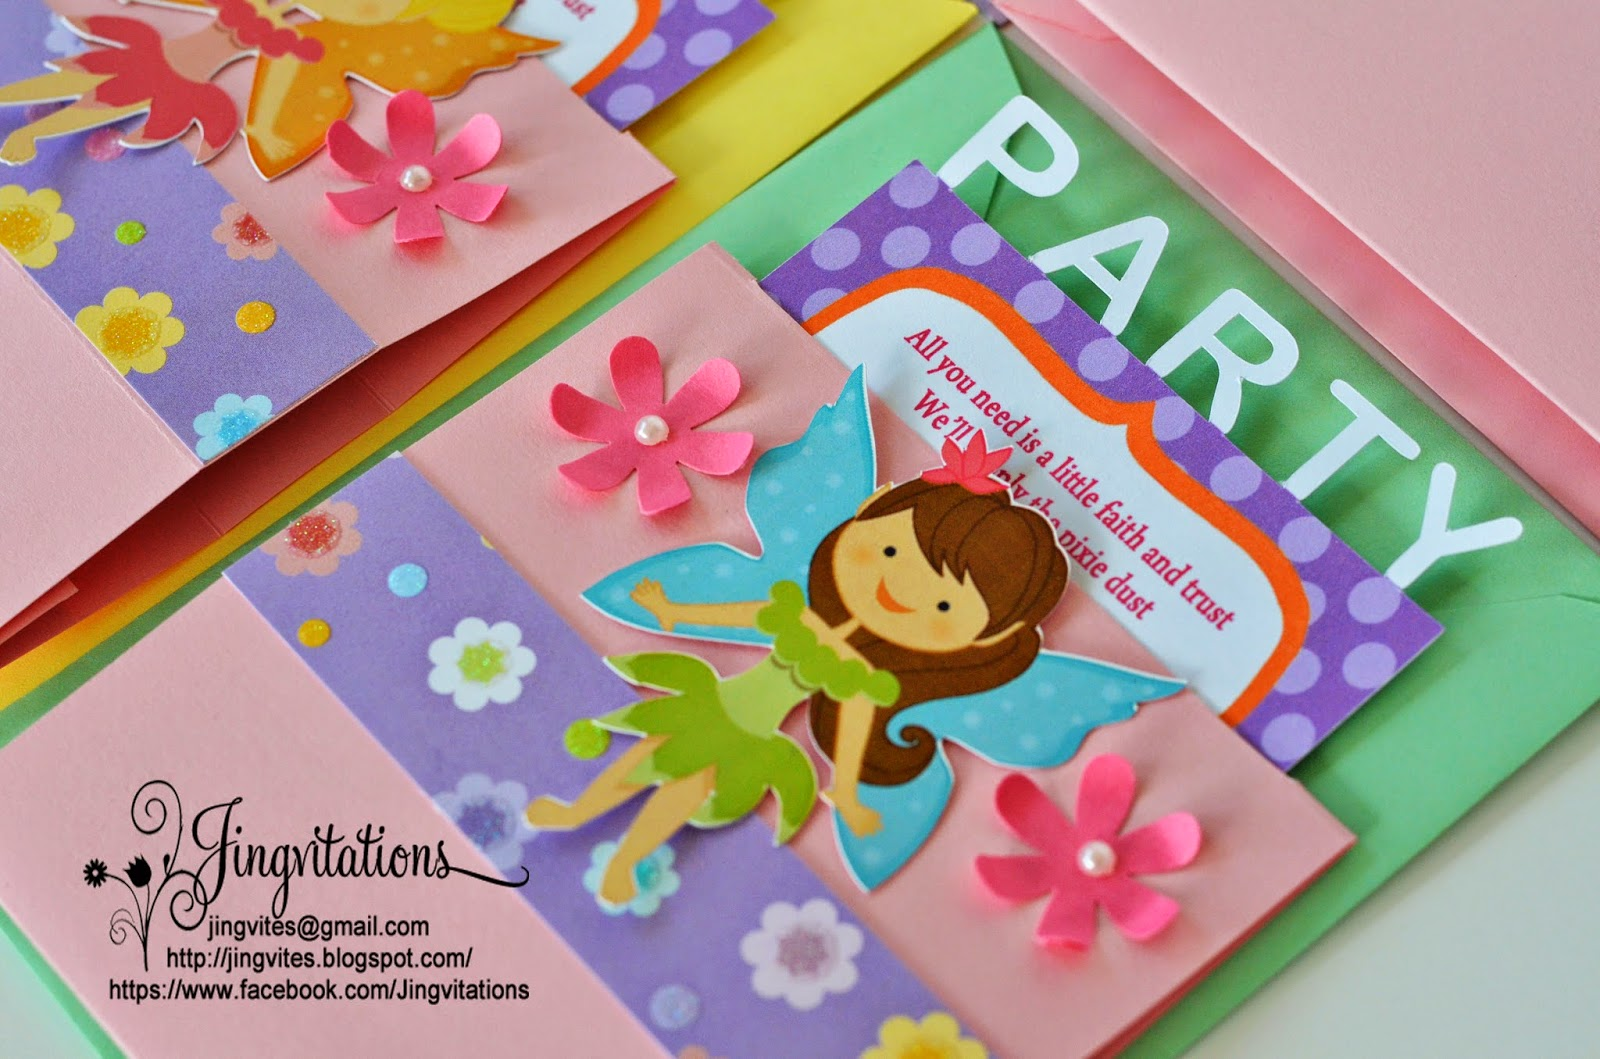 Jingvitations: Tinkerbell Pixie Hollow Fairy Invitations